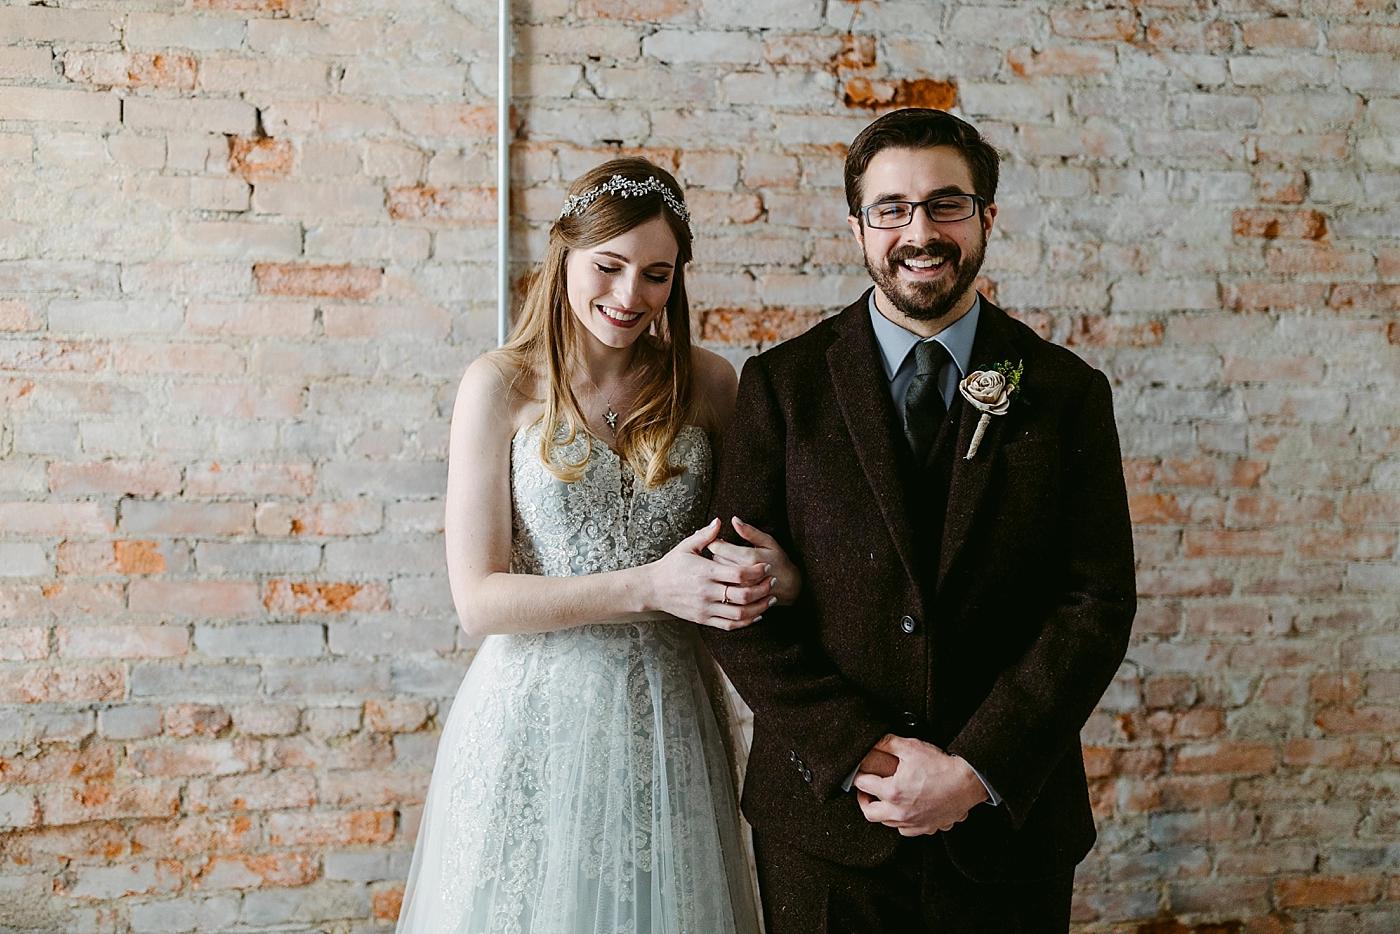 Winter-Squires-Castle-Wedding-James+Jessica_MJPHOTO2017-181.jpg